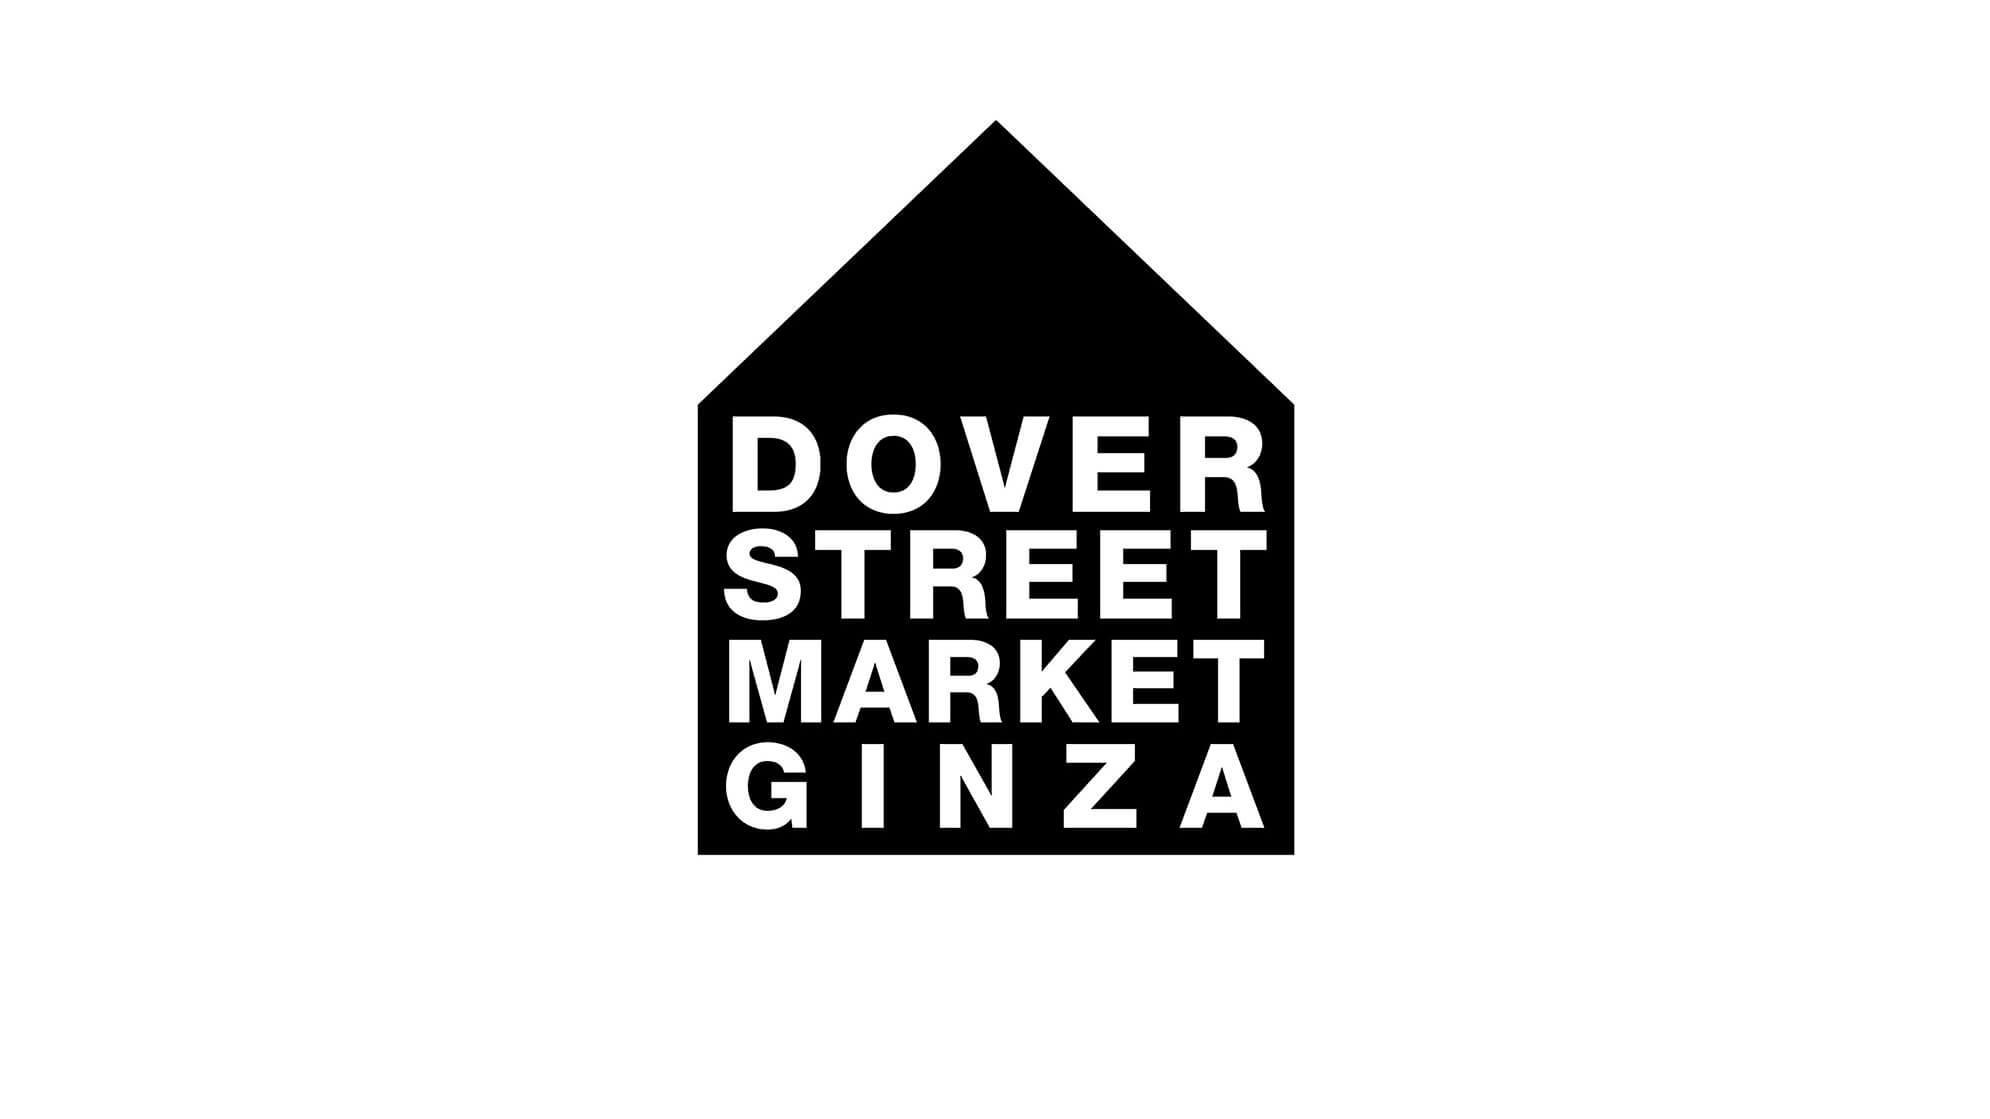 DOVER STREET MARKET GINZA 販売職のカバー写真